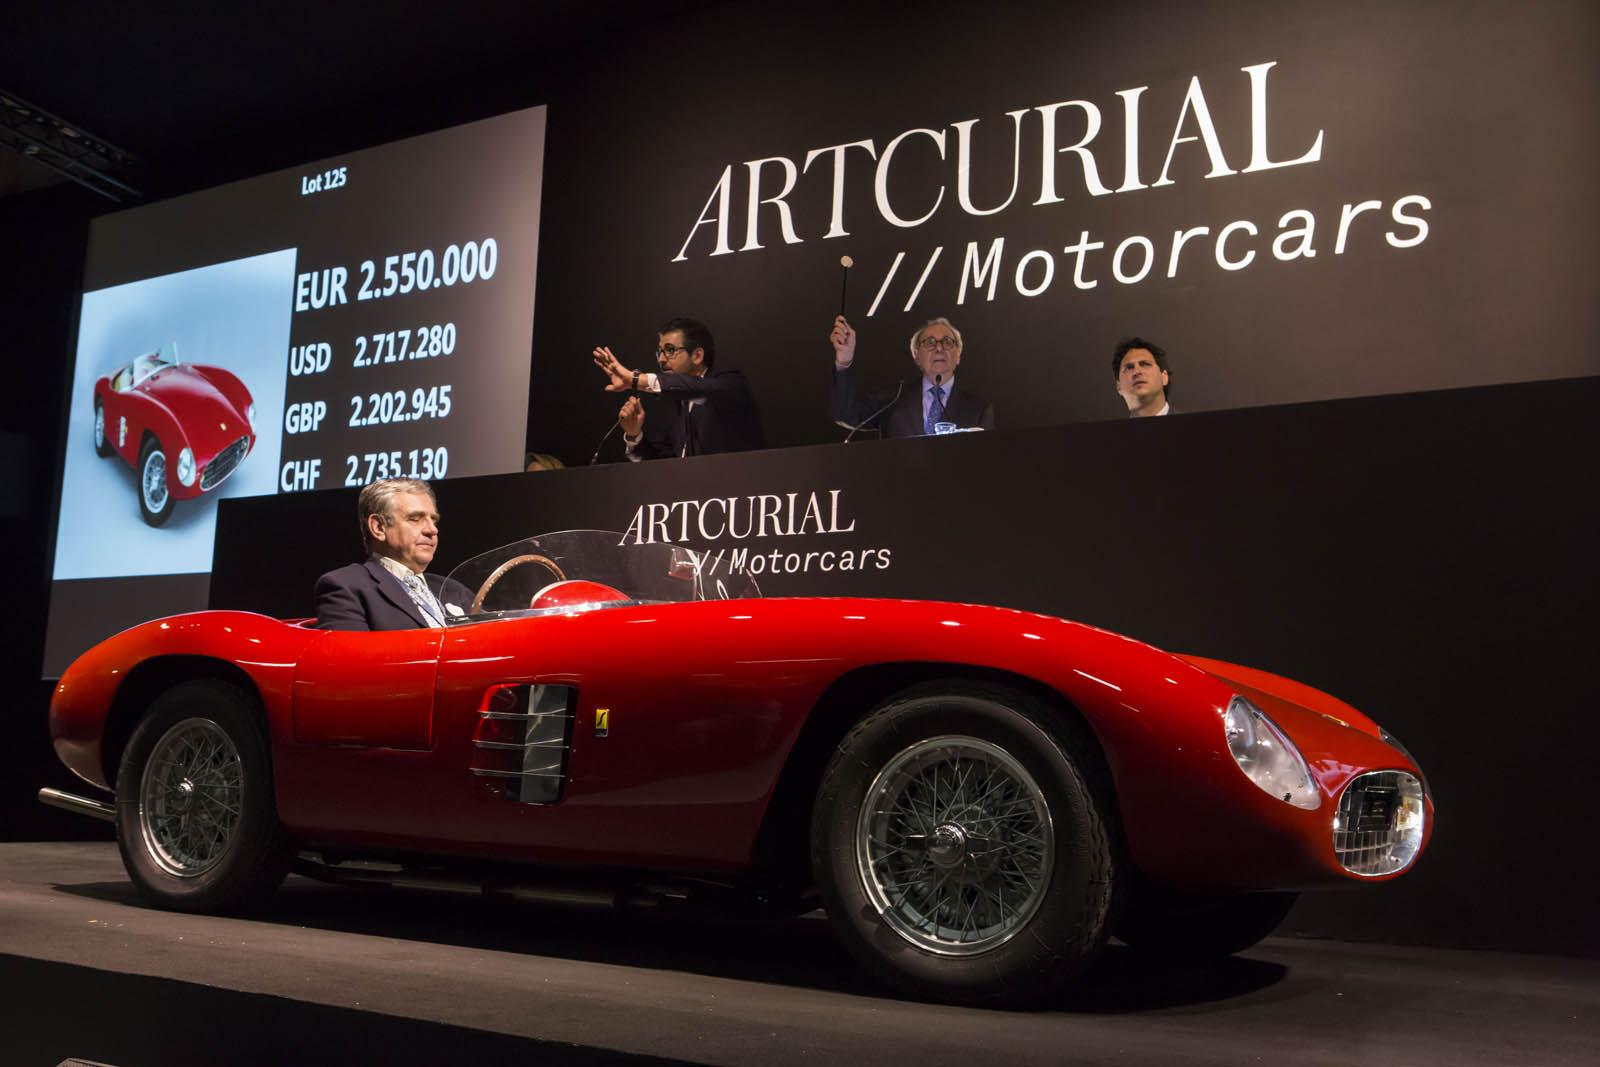 Lot+125_2+1948+Ferrari+166+Spyder+Corsa+par+Scaglietti+%C2%A9Artcurial+copy